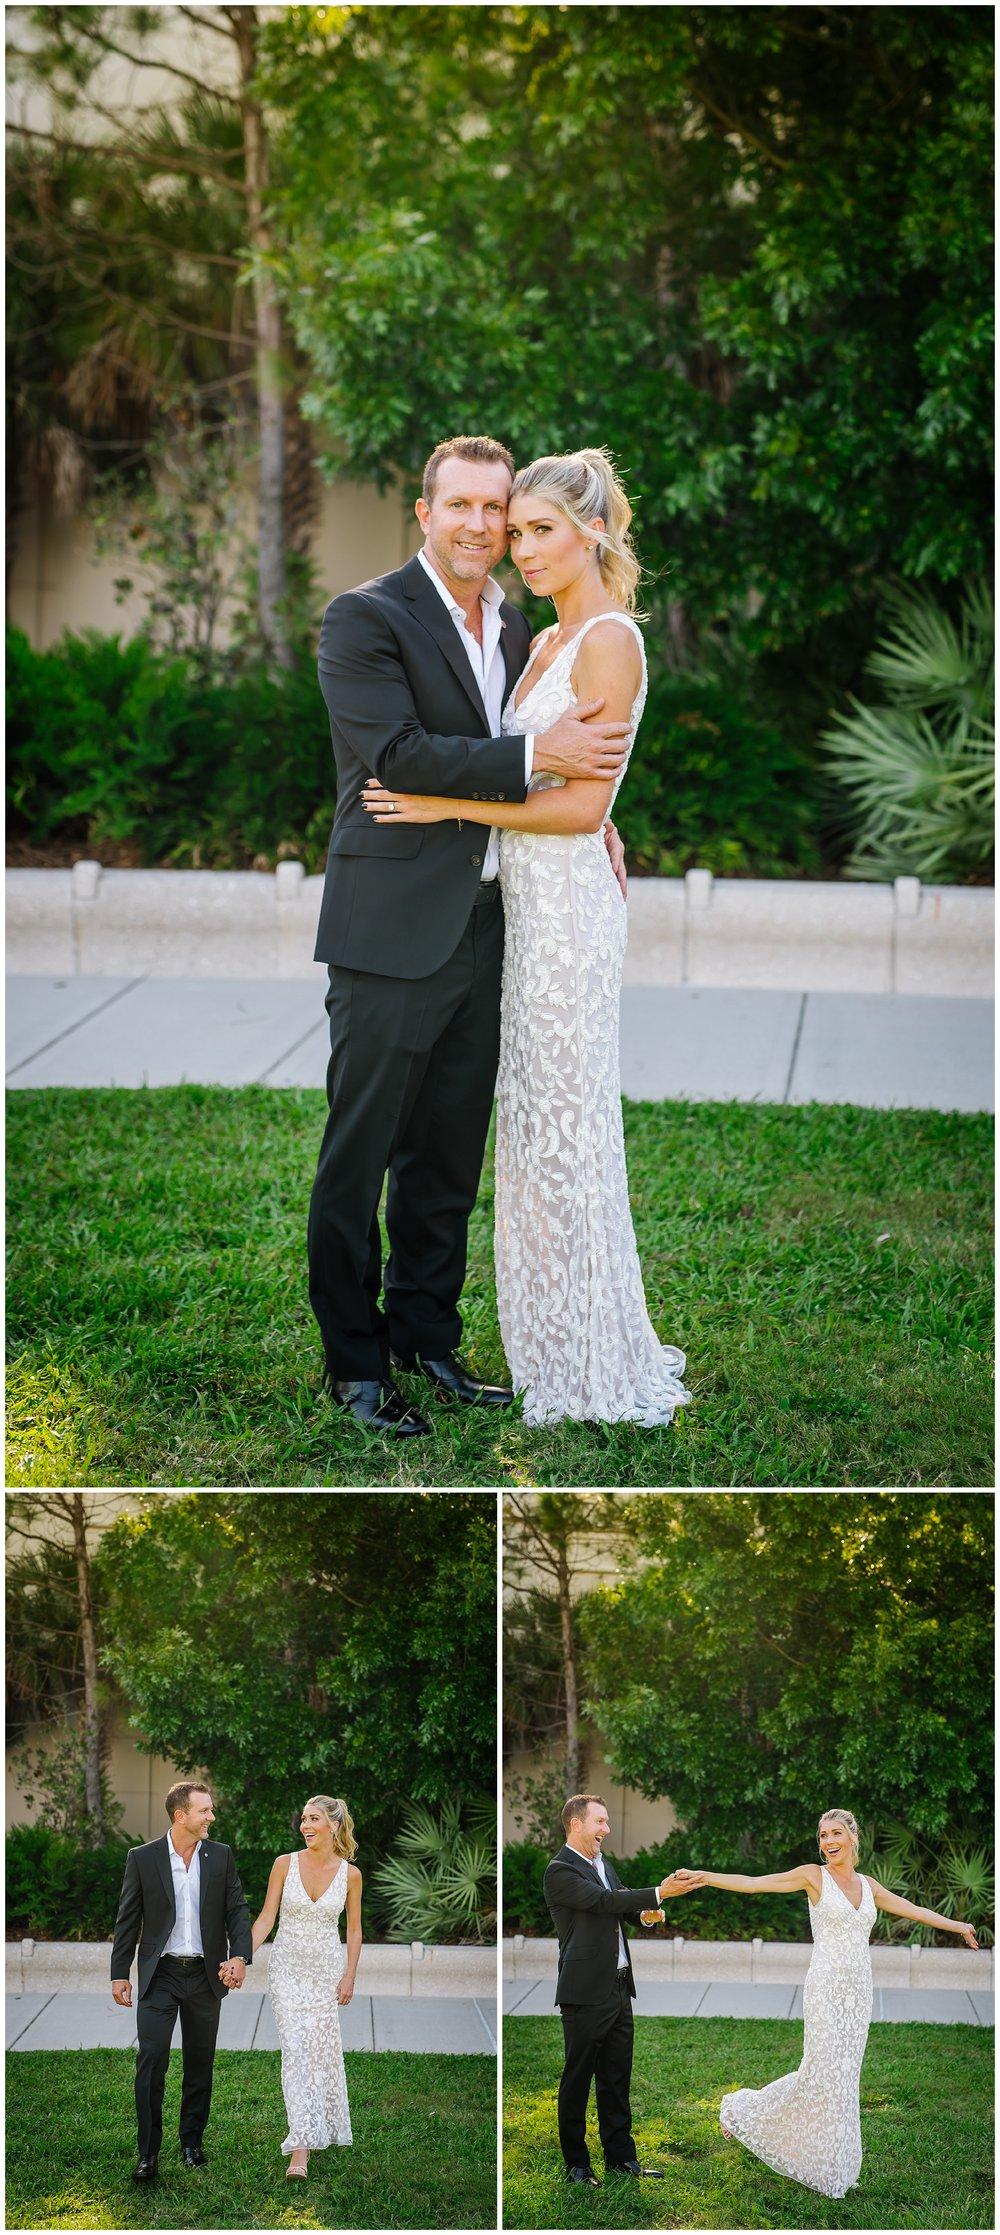 Tampa-wedding-photographer-downtown-bhldn-intimate_0020.jpg